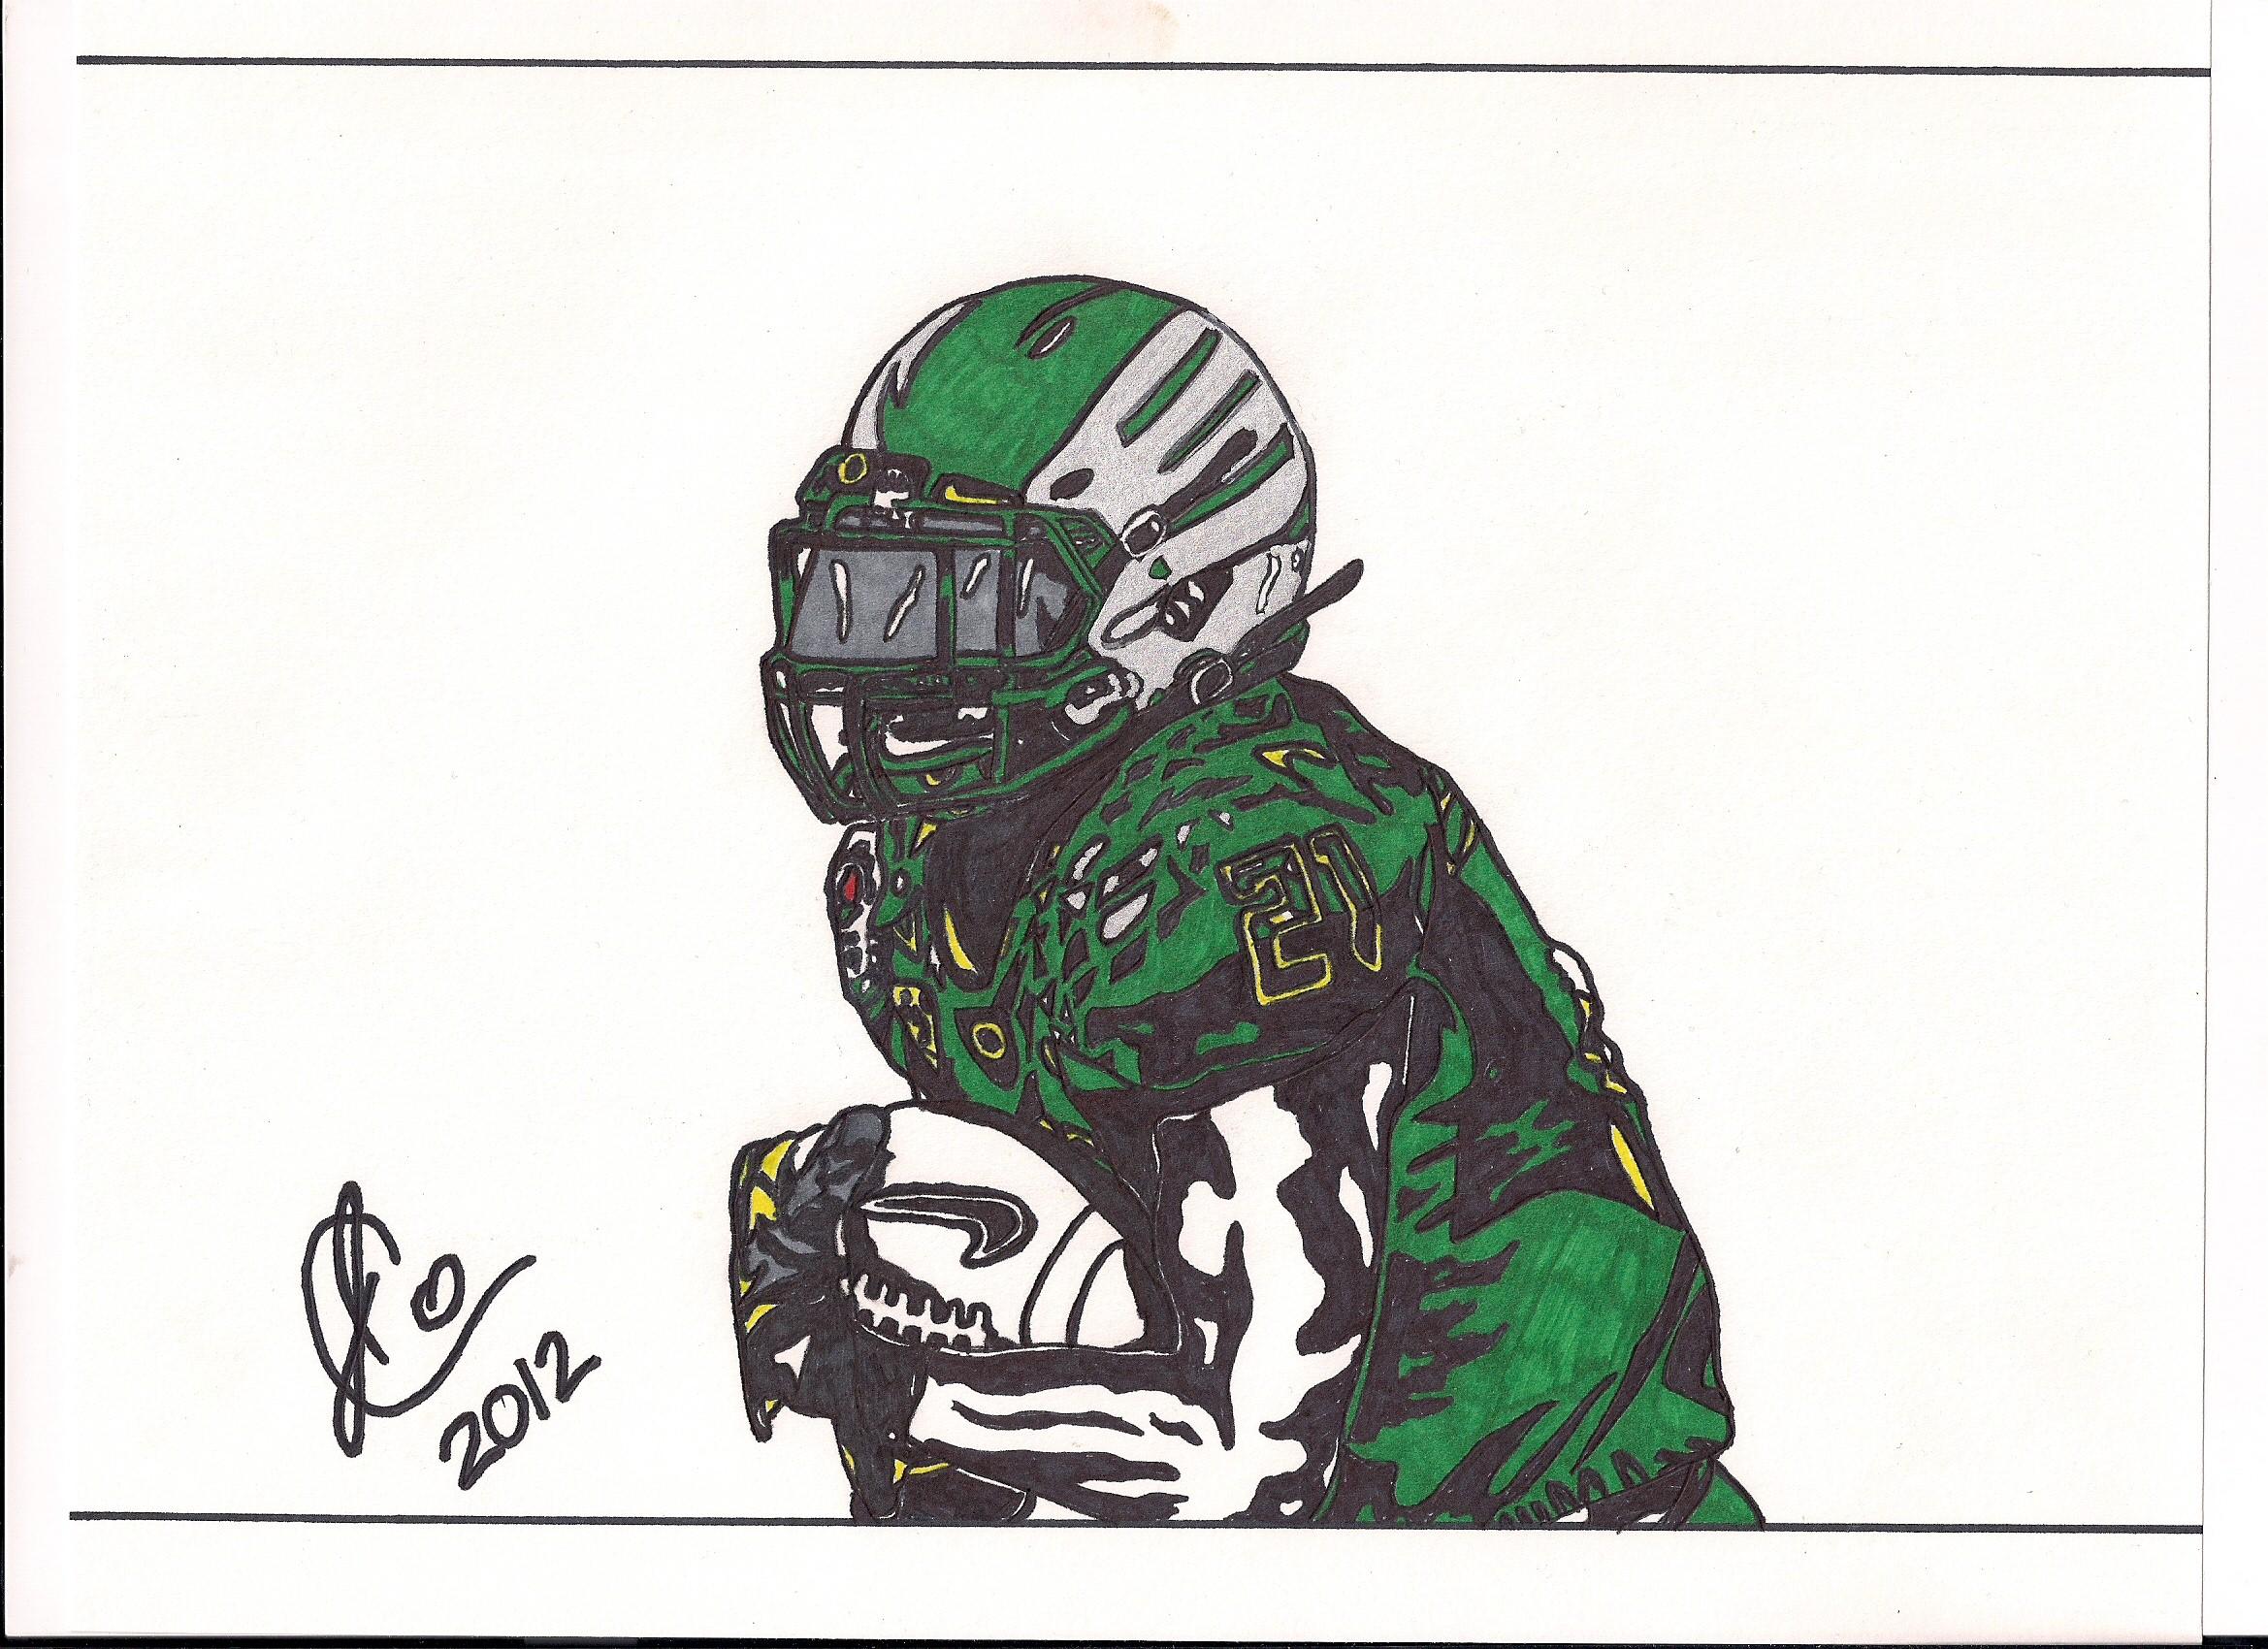 oregonduckslogocoloringpages oregon ducks helmet coloring pages - Buffalo Bills Helmet Coloring Page